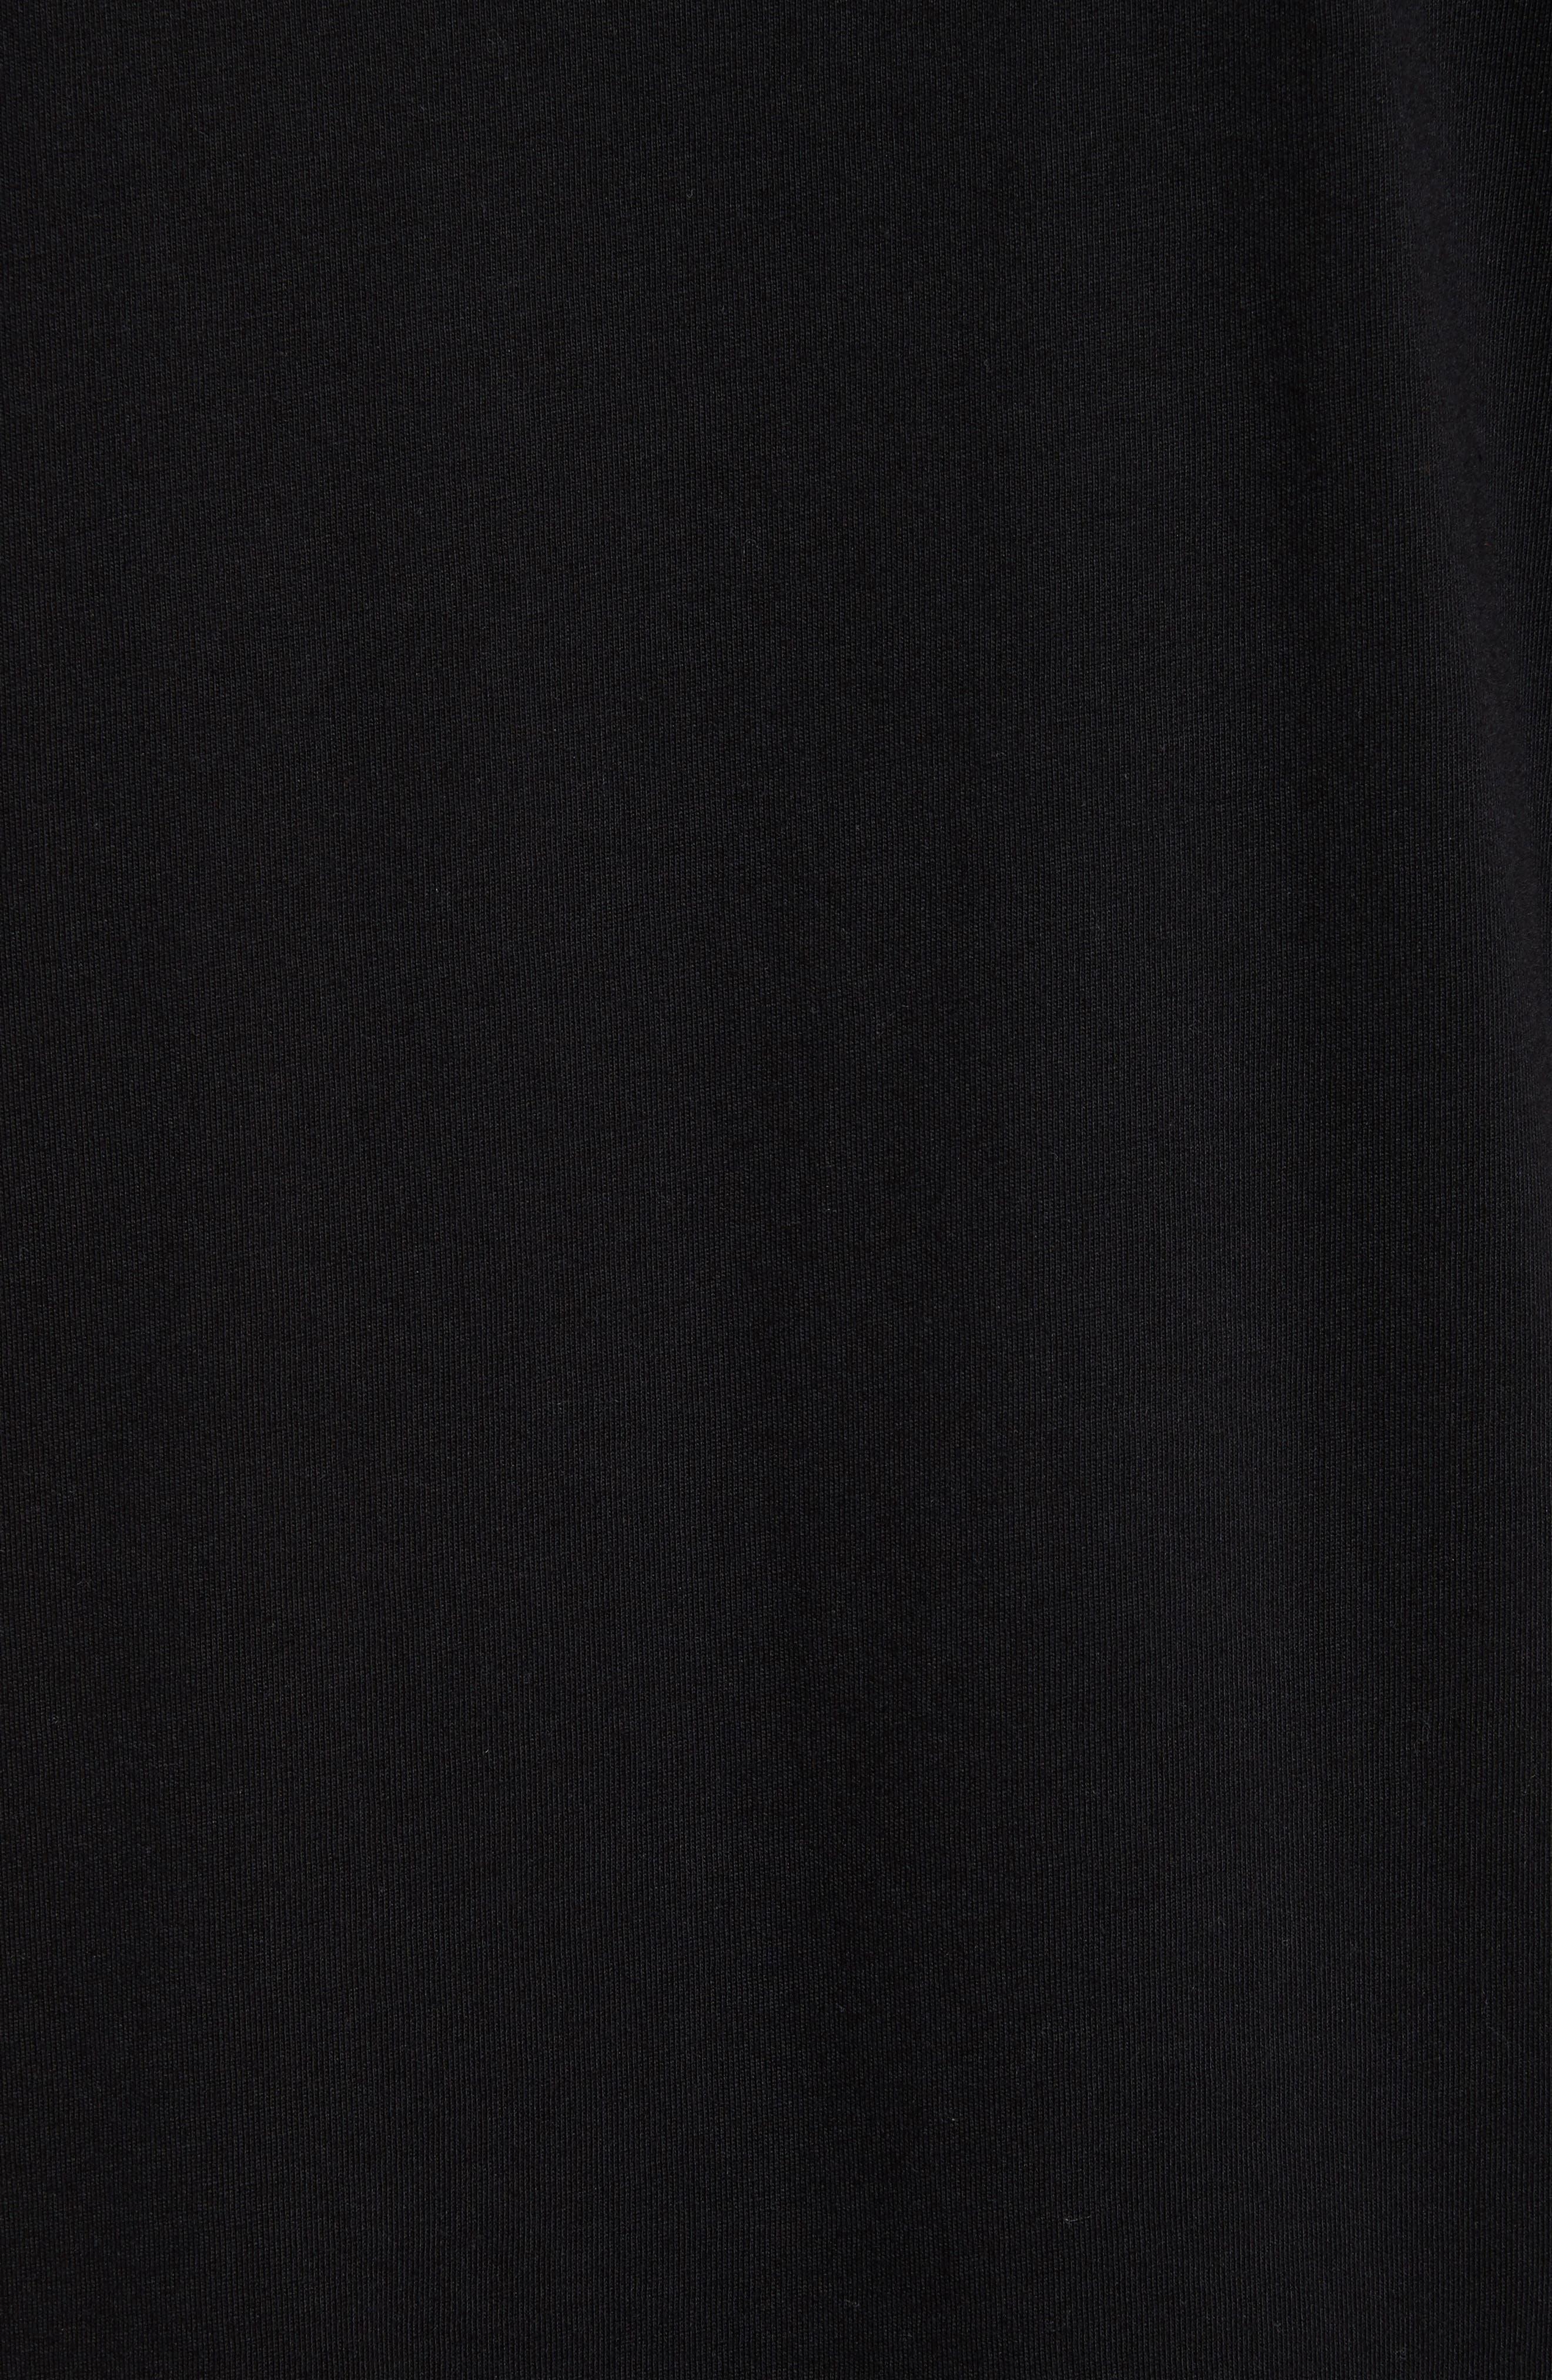 VERSUS by Versace Electric Lion Graphic T-Shirt,                             Alternate thumbnail 5, color,                             005